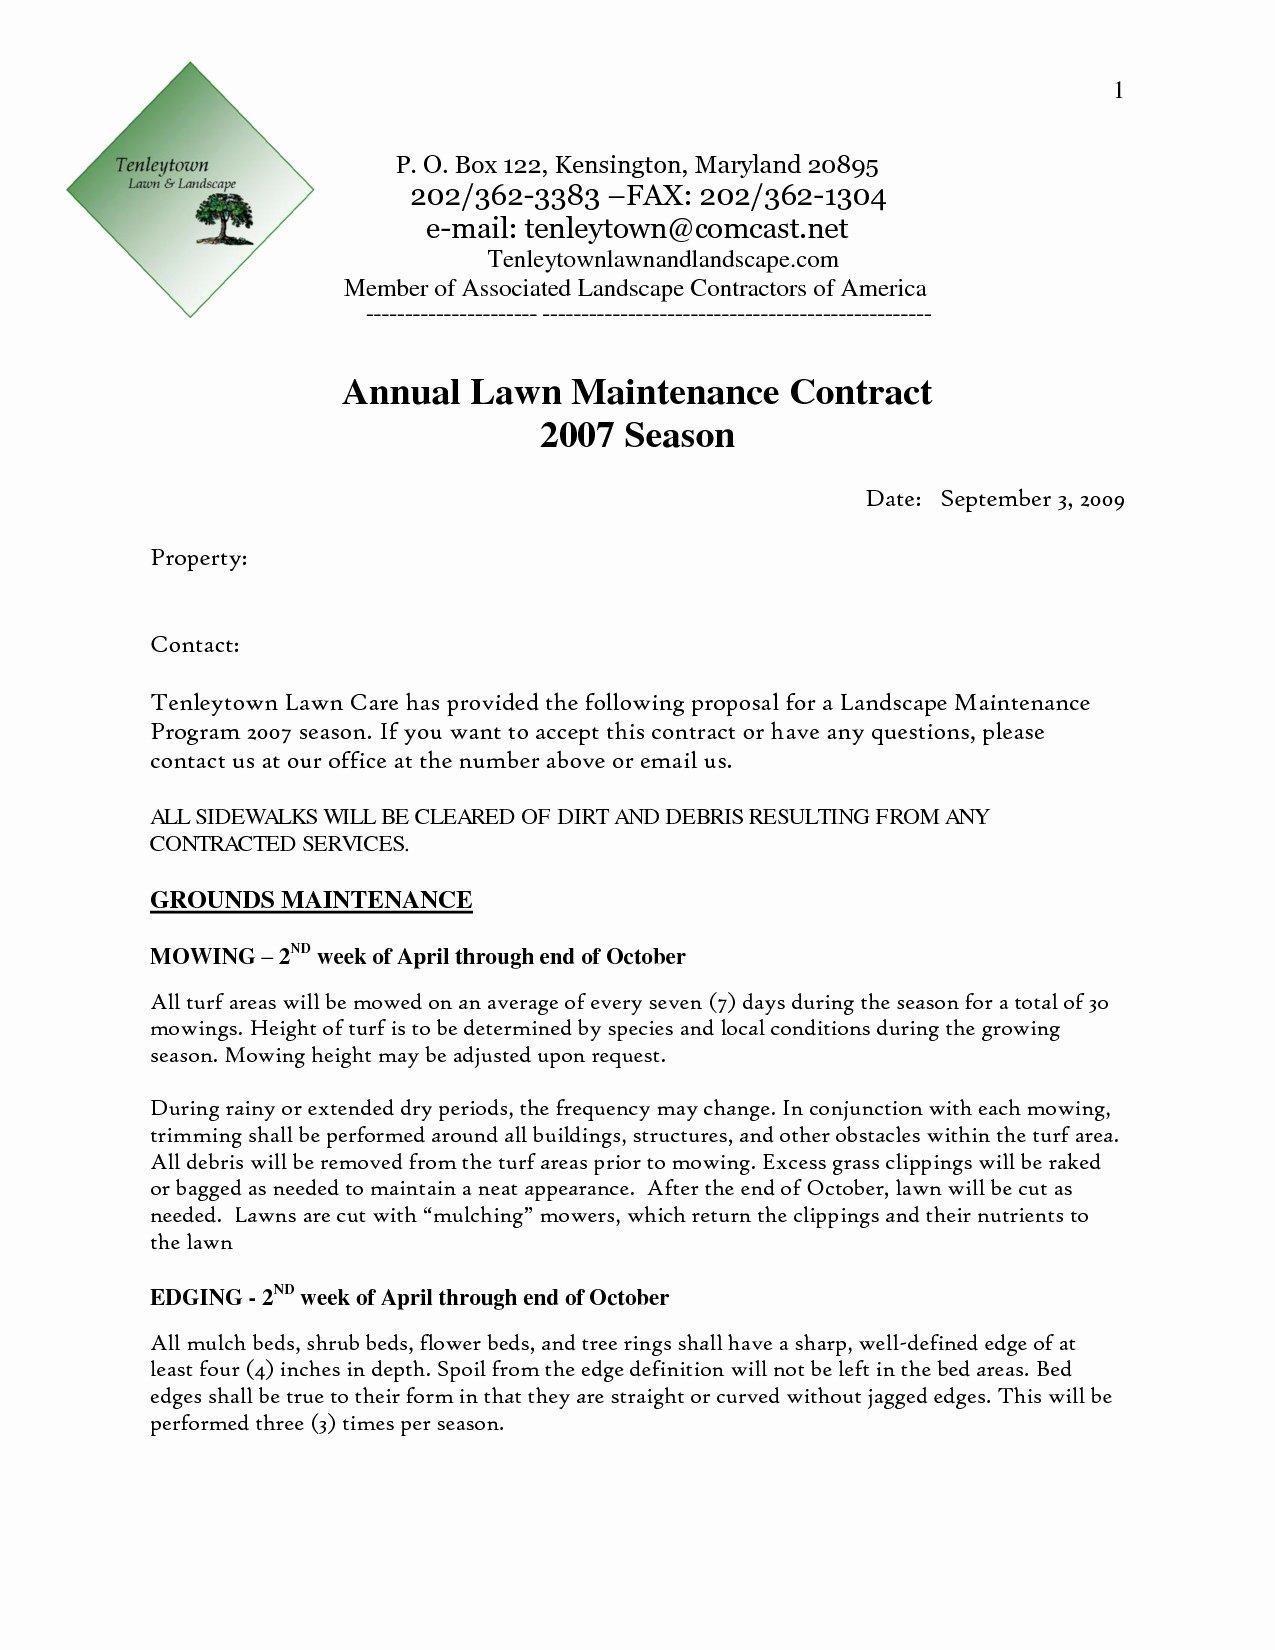 landscaping bid templates